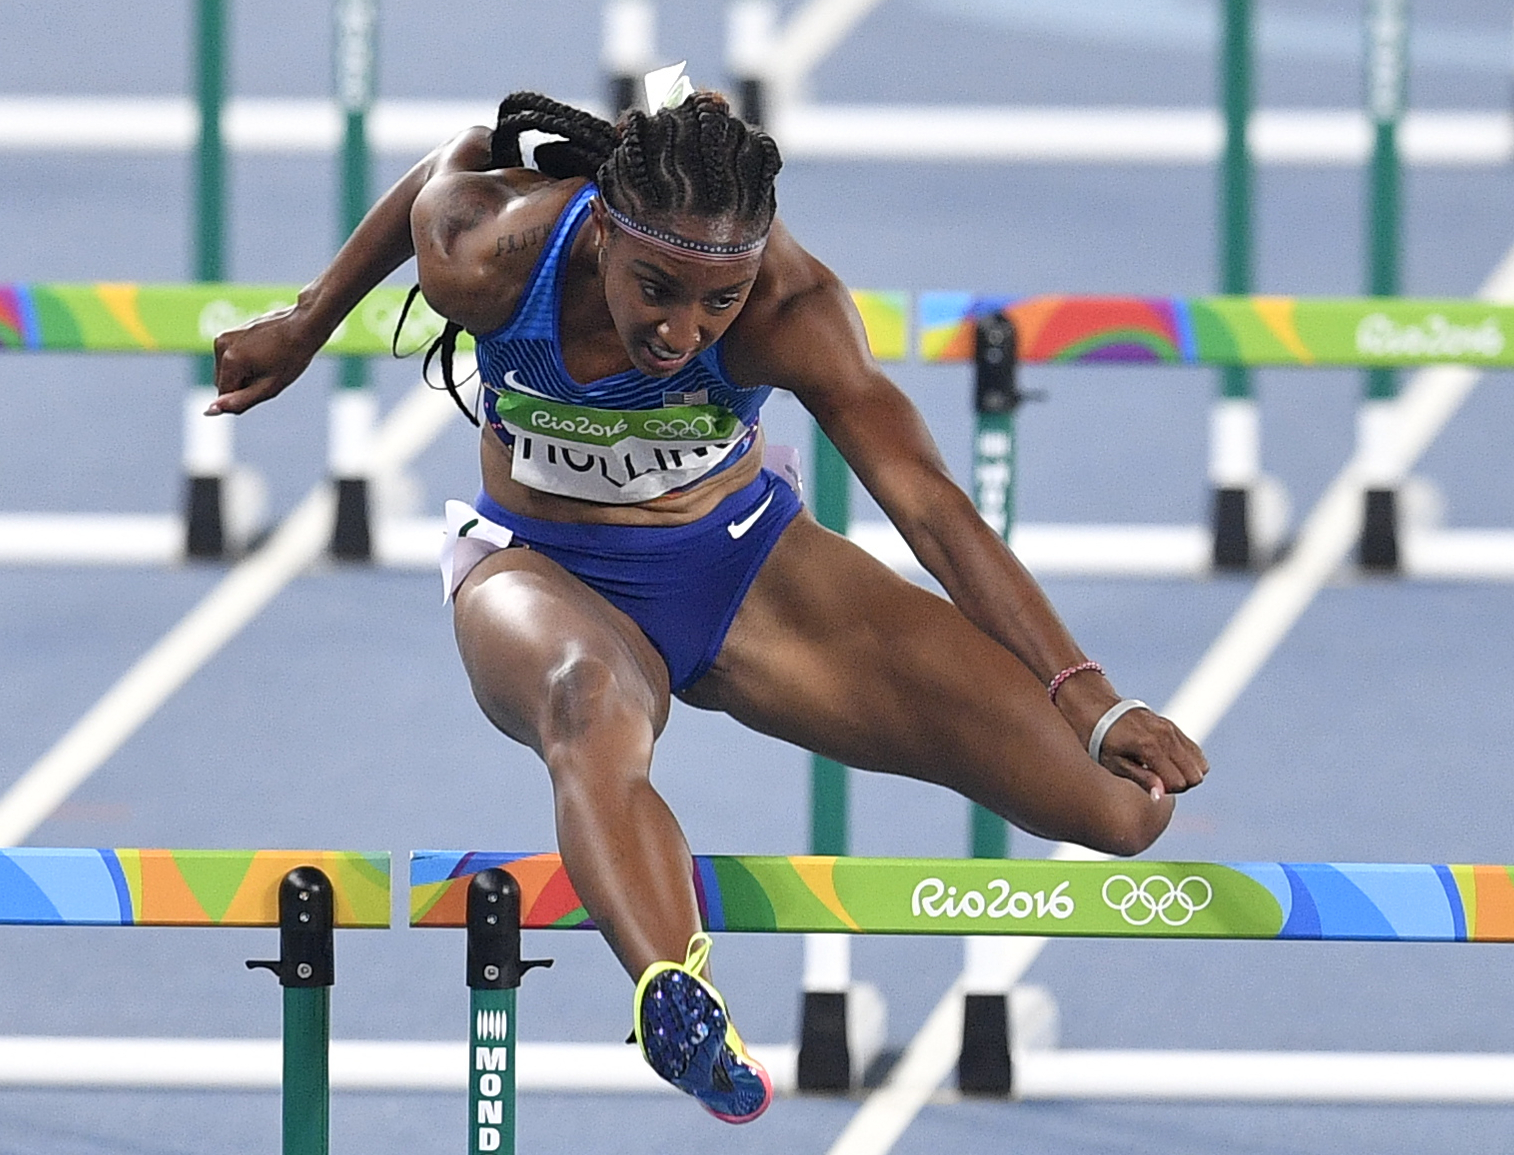 U.S. Olympic hurdle champion Brianna Rollins. (AP Photo/Martin Meissner)